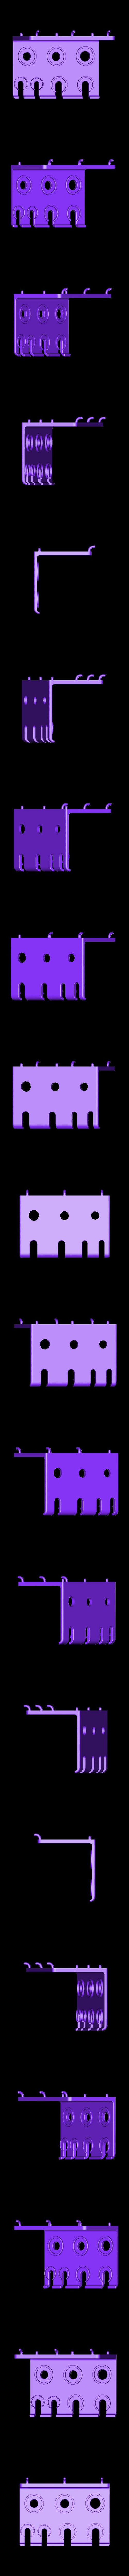 Pins.stl Download free STL file Holder for Electrician Screwdriver Set 7pcs 012 I for screws or peg board • 3D print model, Wiesemann1893